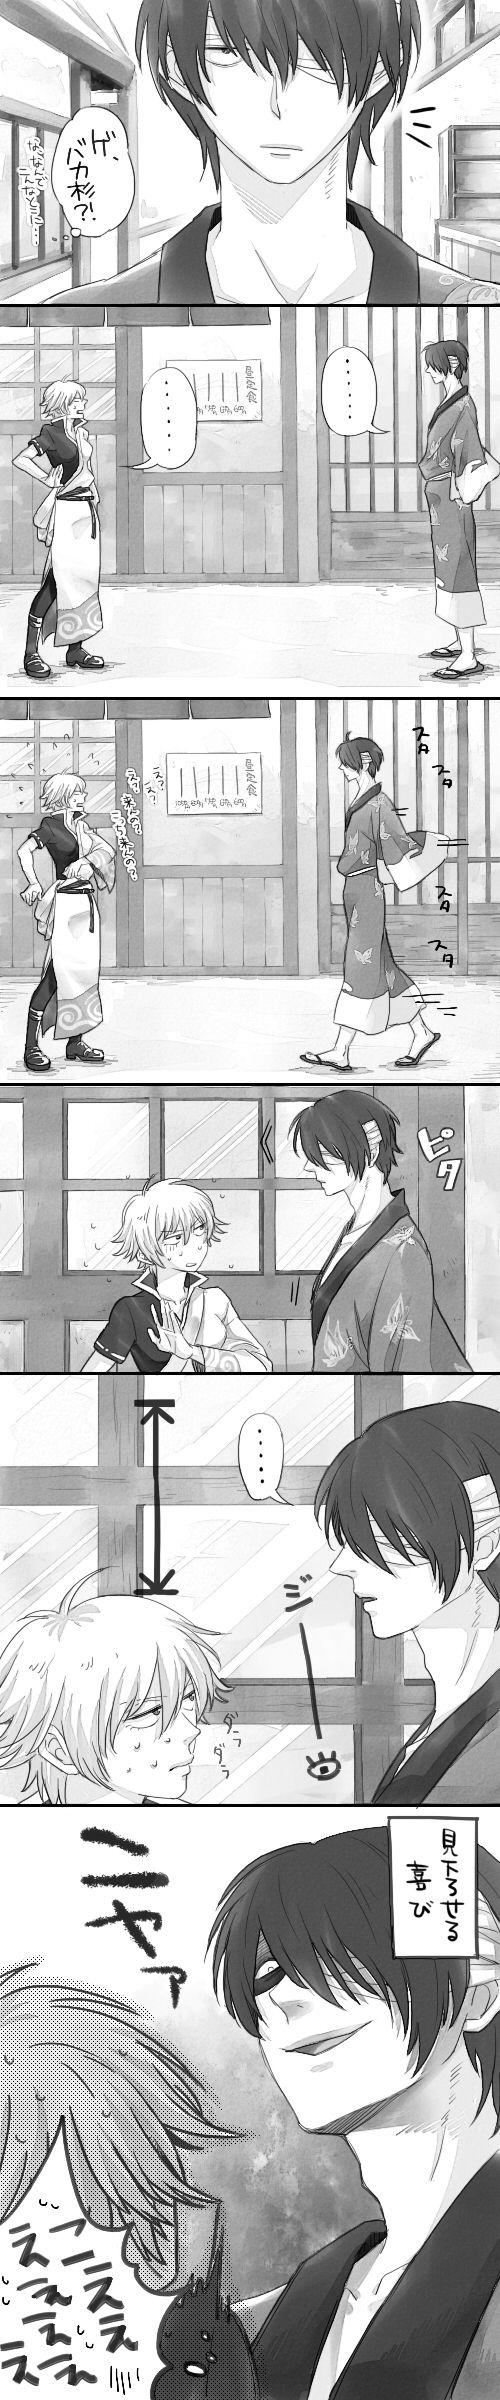 Gintama/ Takasugi/ Ginko